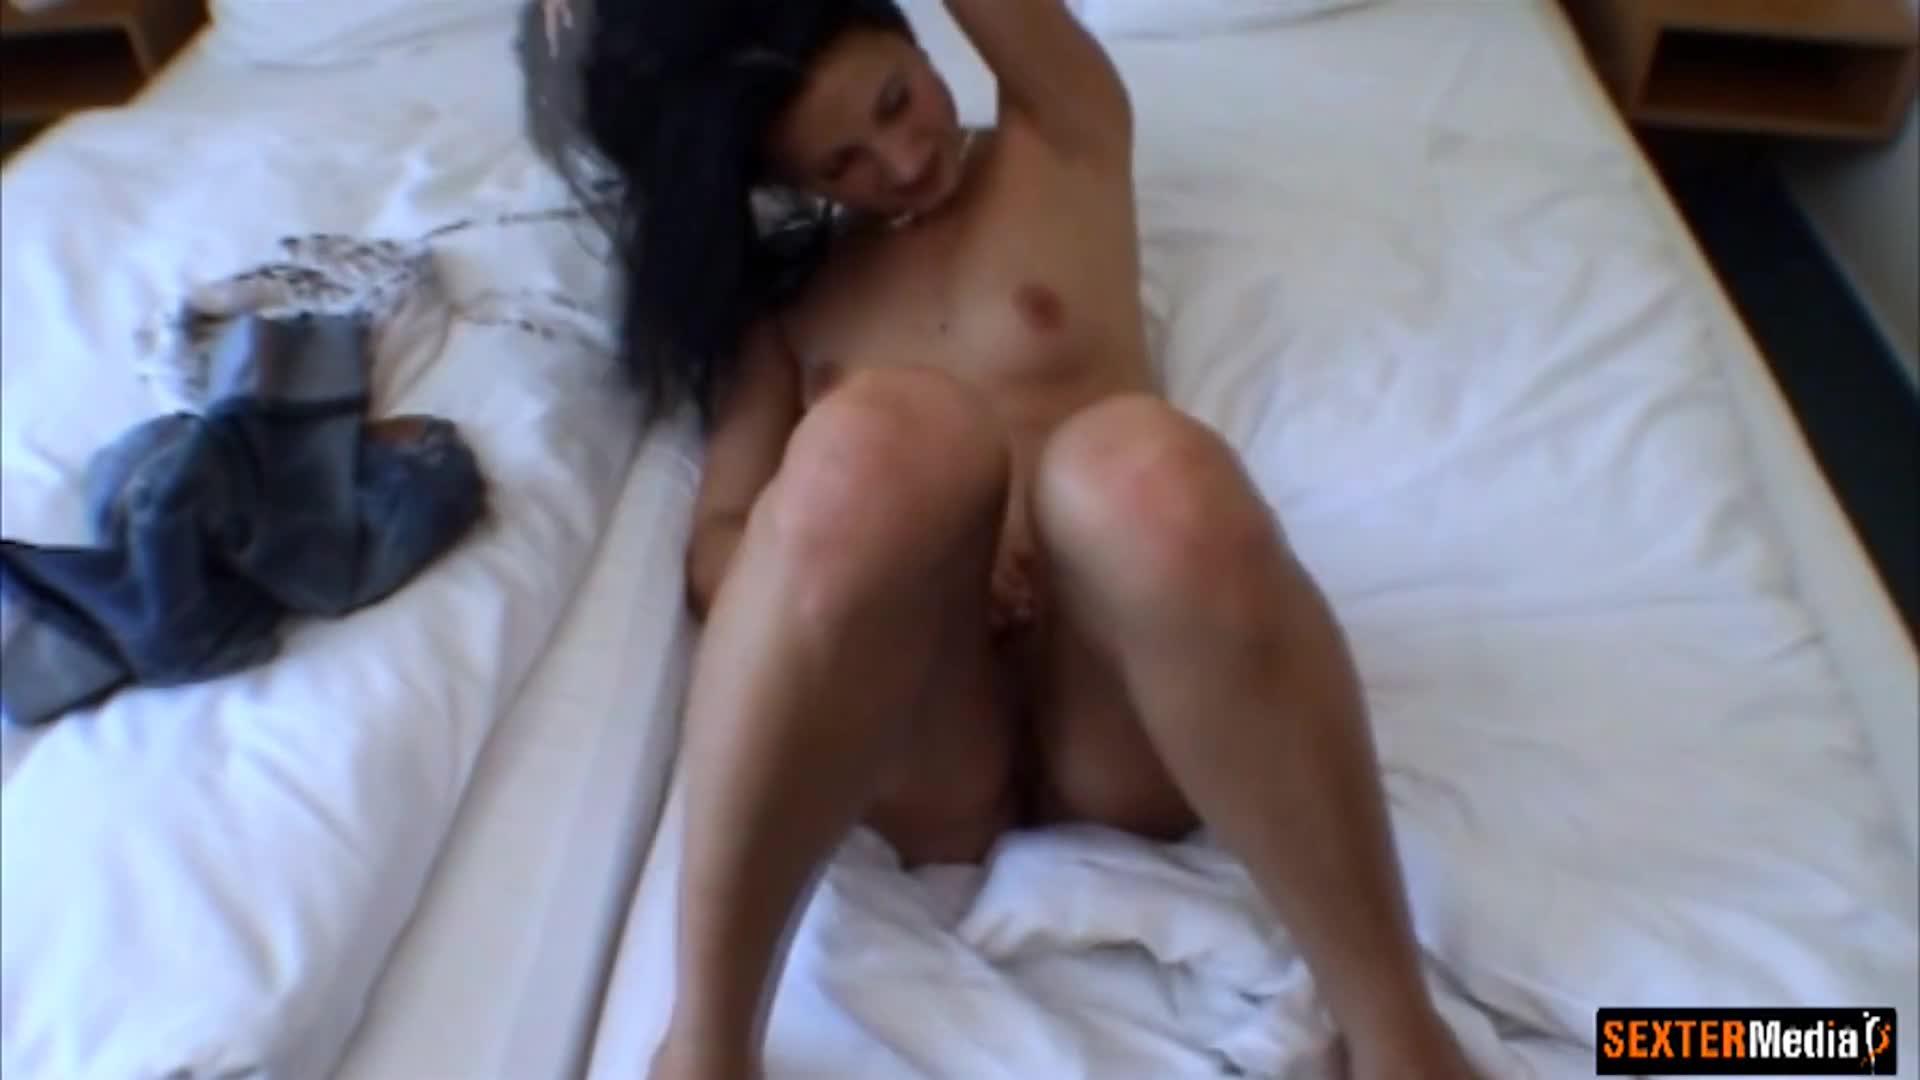 hardcore s&m hardcore porn | Kim (19) - A blowjob is duty [FullHD 1080P] | clips - k2s.tv